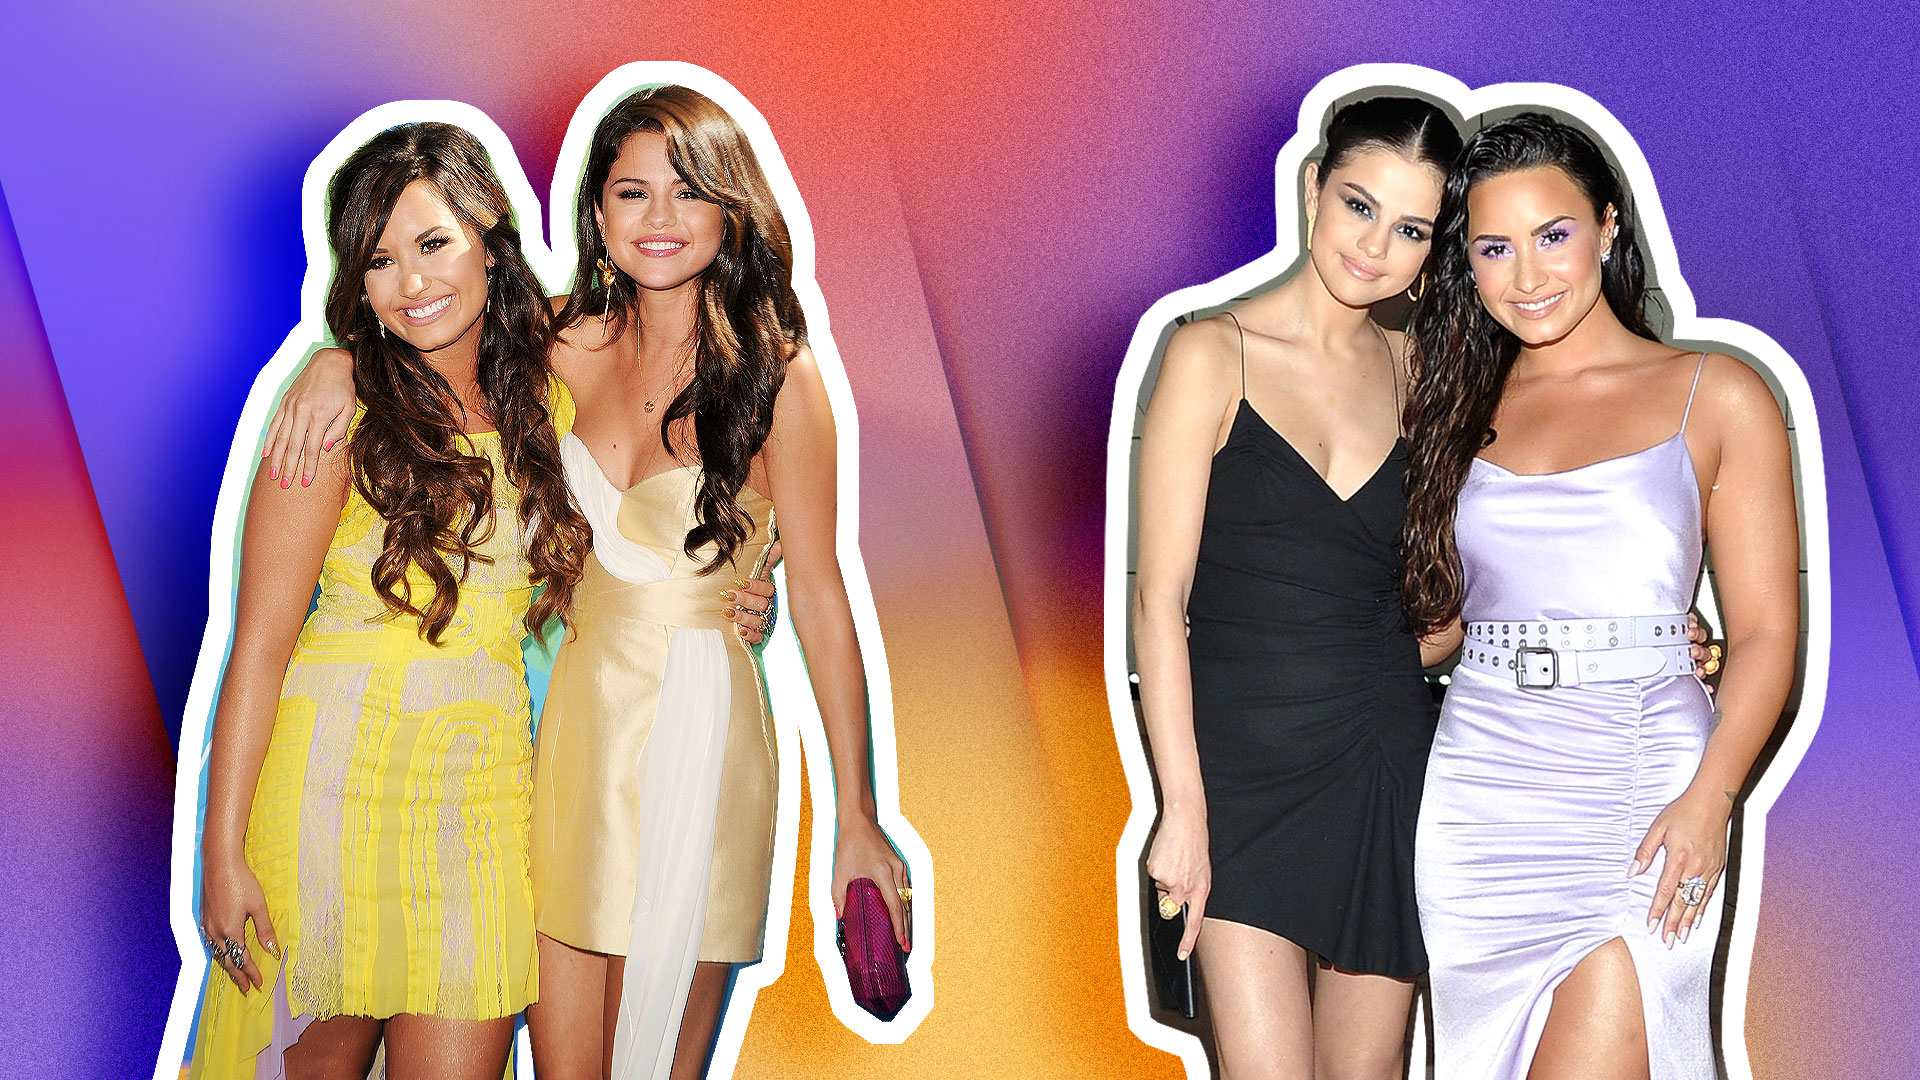 STYLECASTER | Demi Lovato and Selena Gomez Timeline